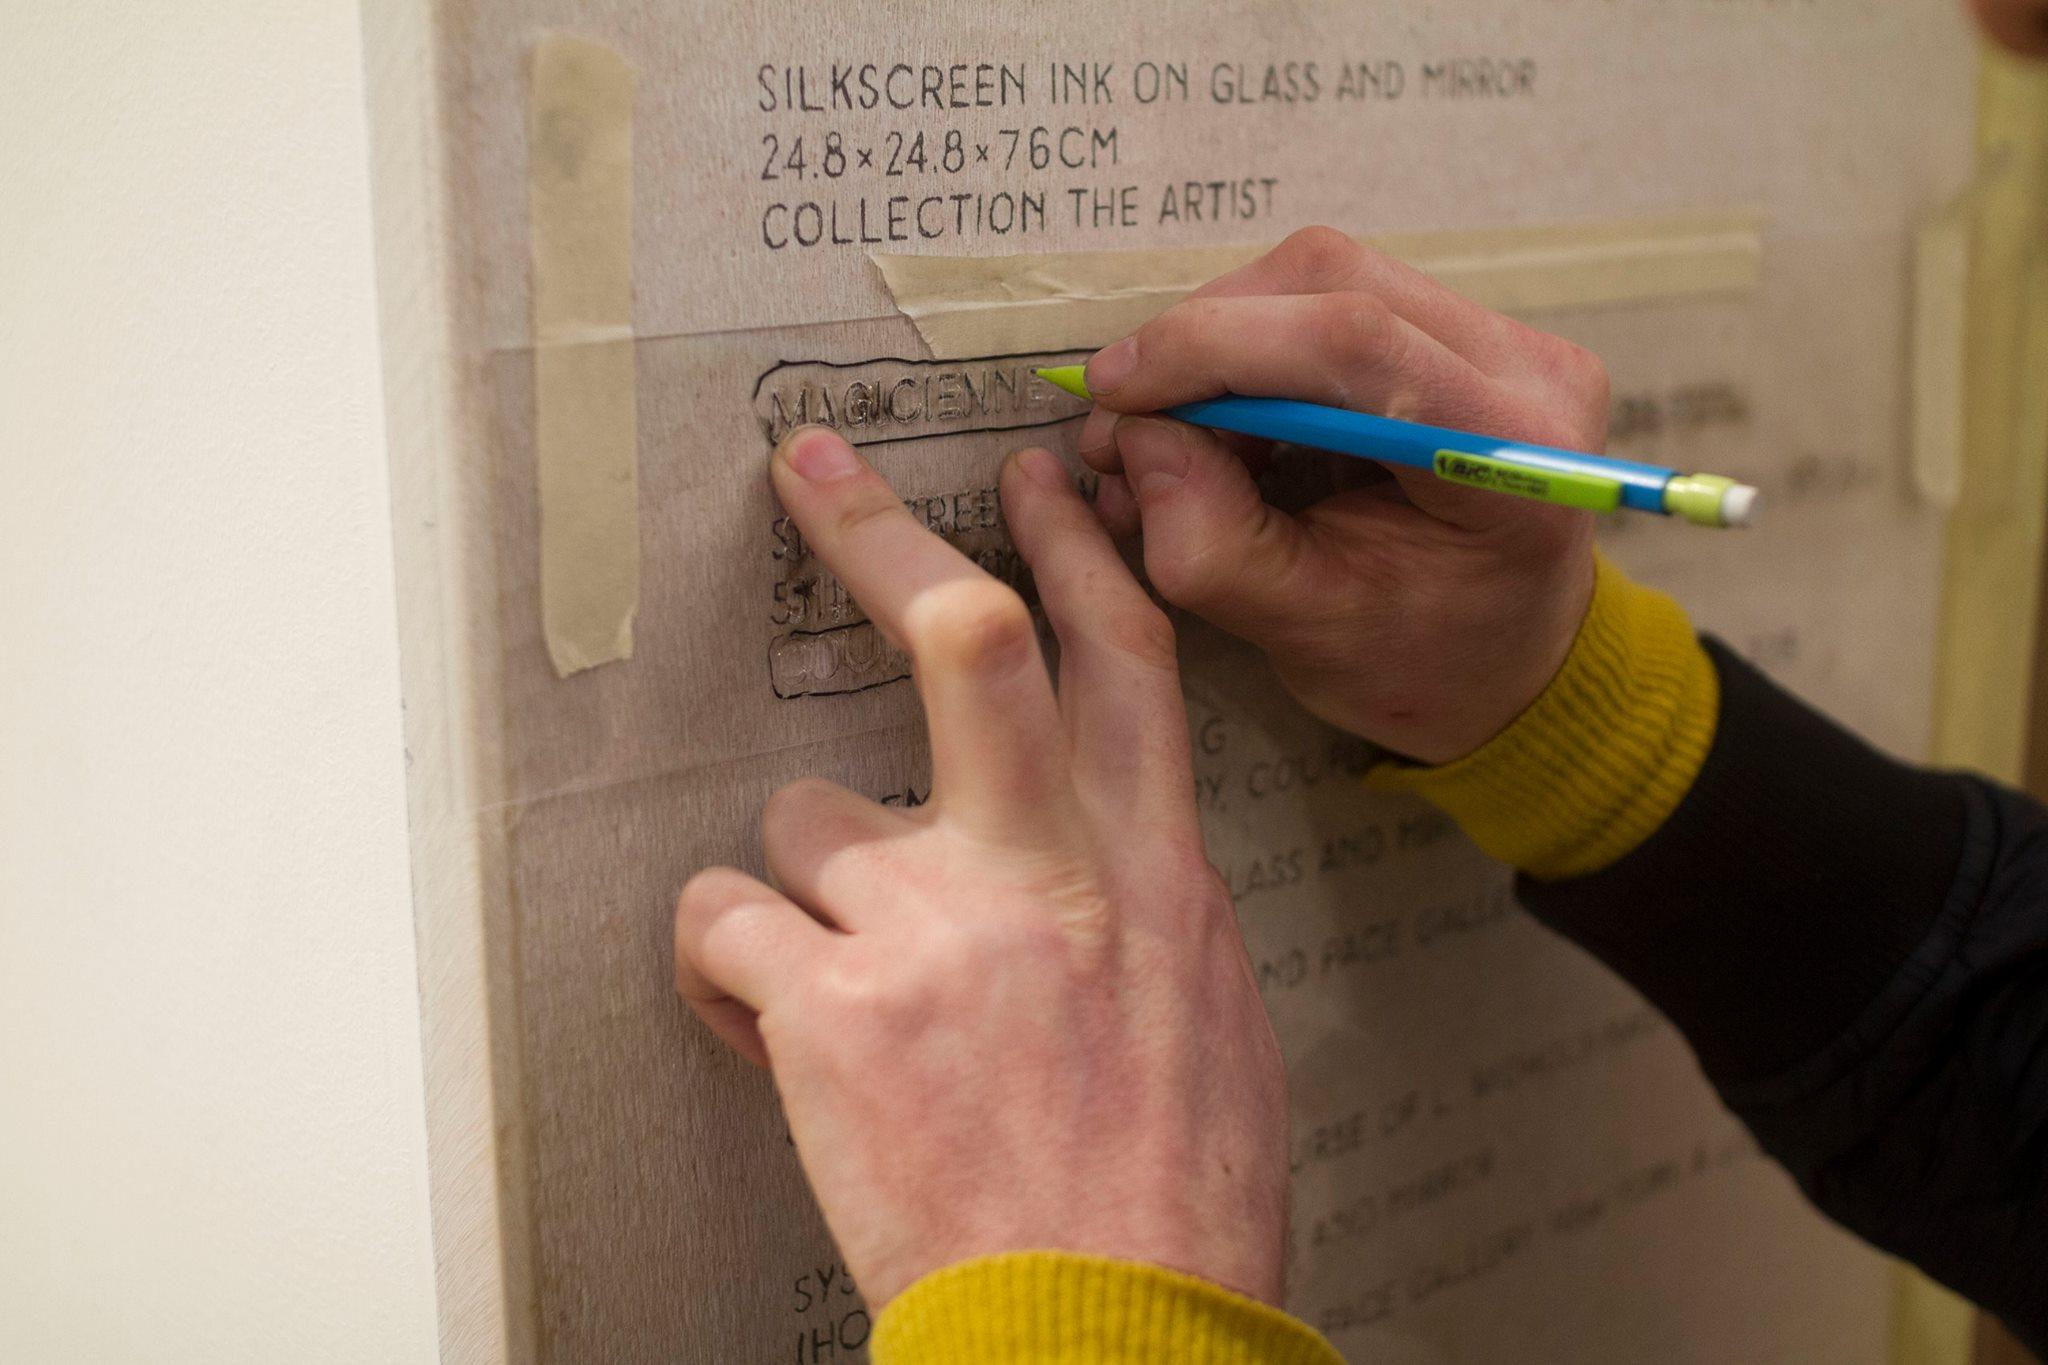 documentation/signage-belgian-pavilion/venice-lettering.jpg